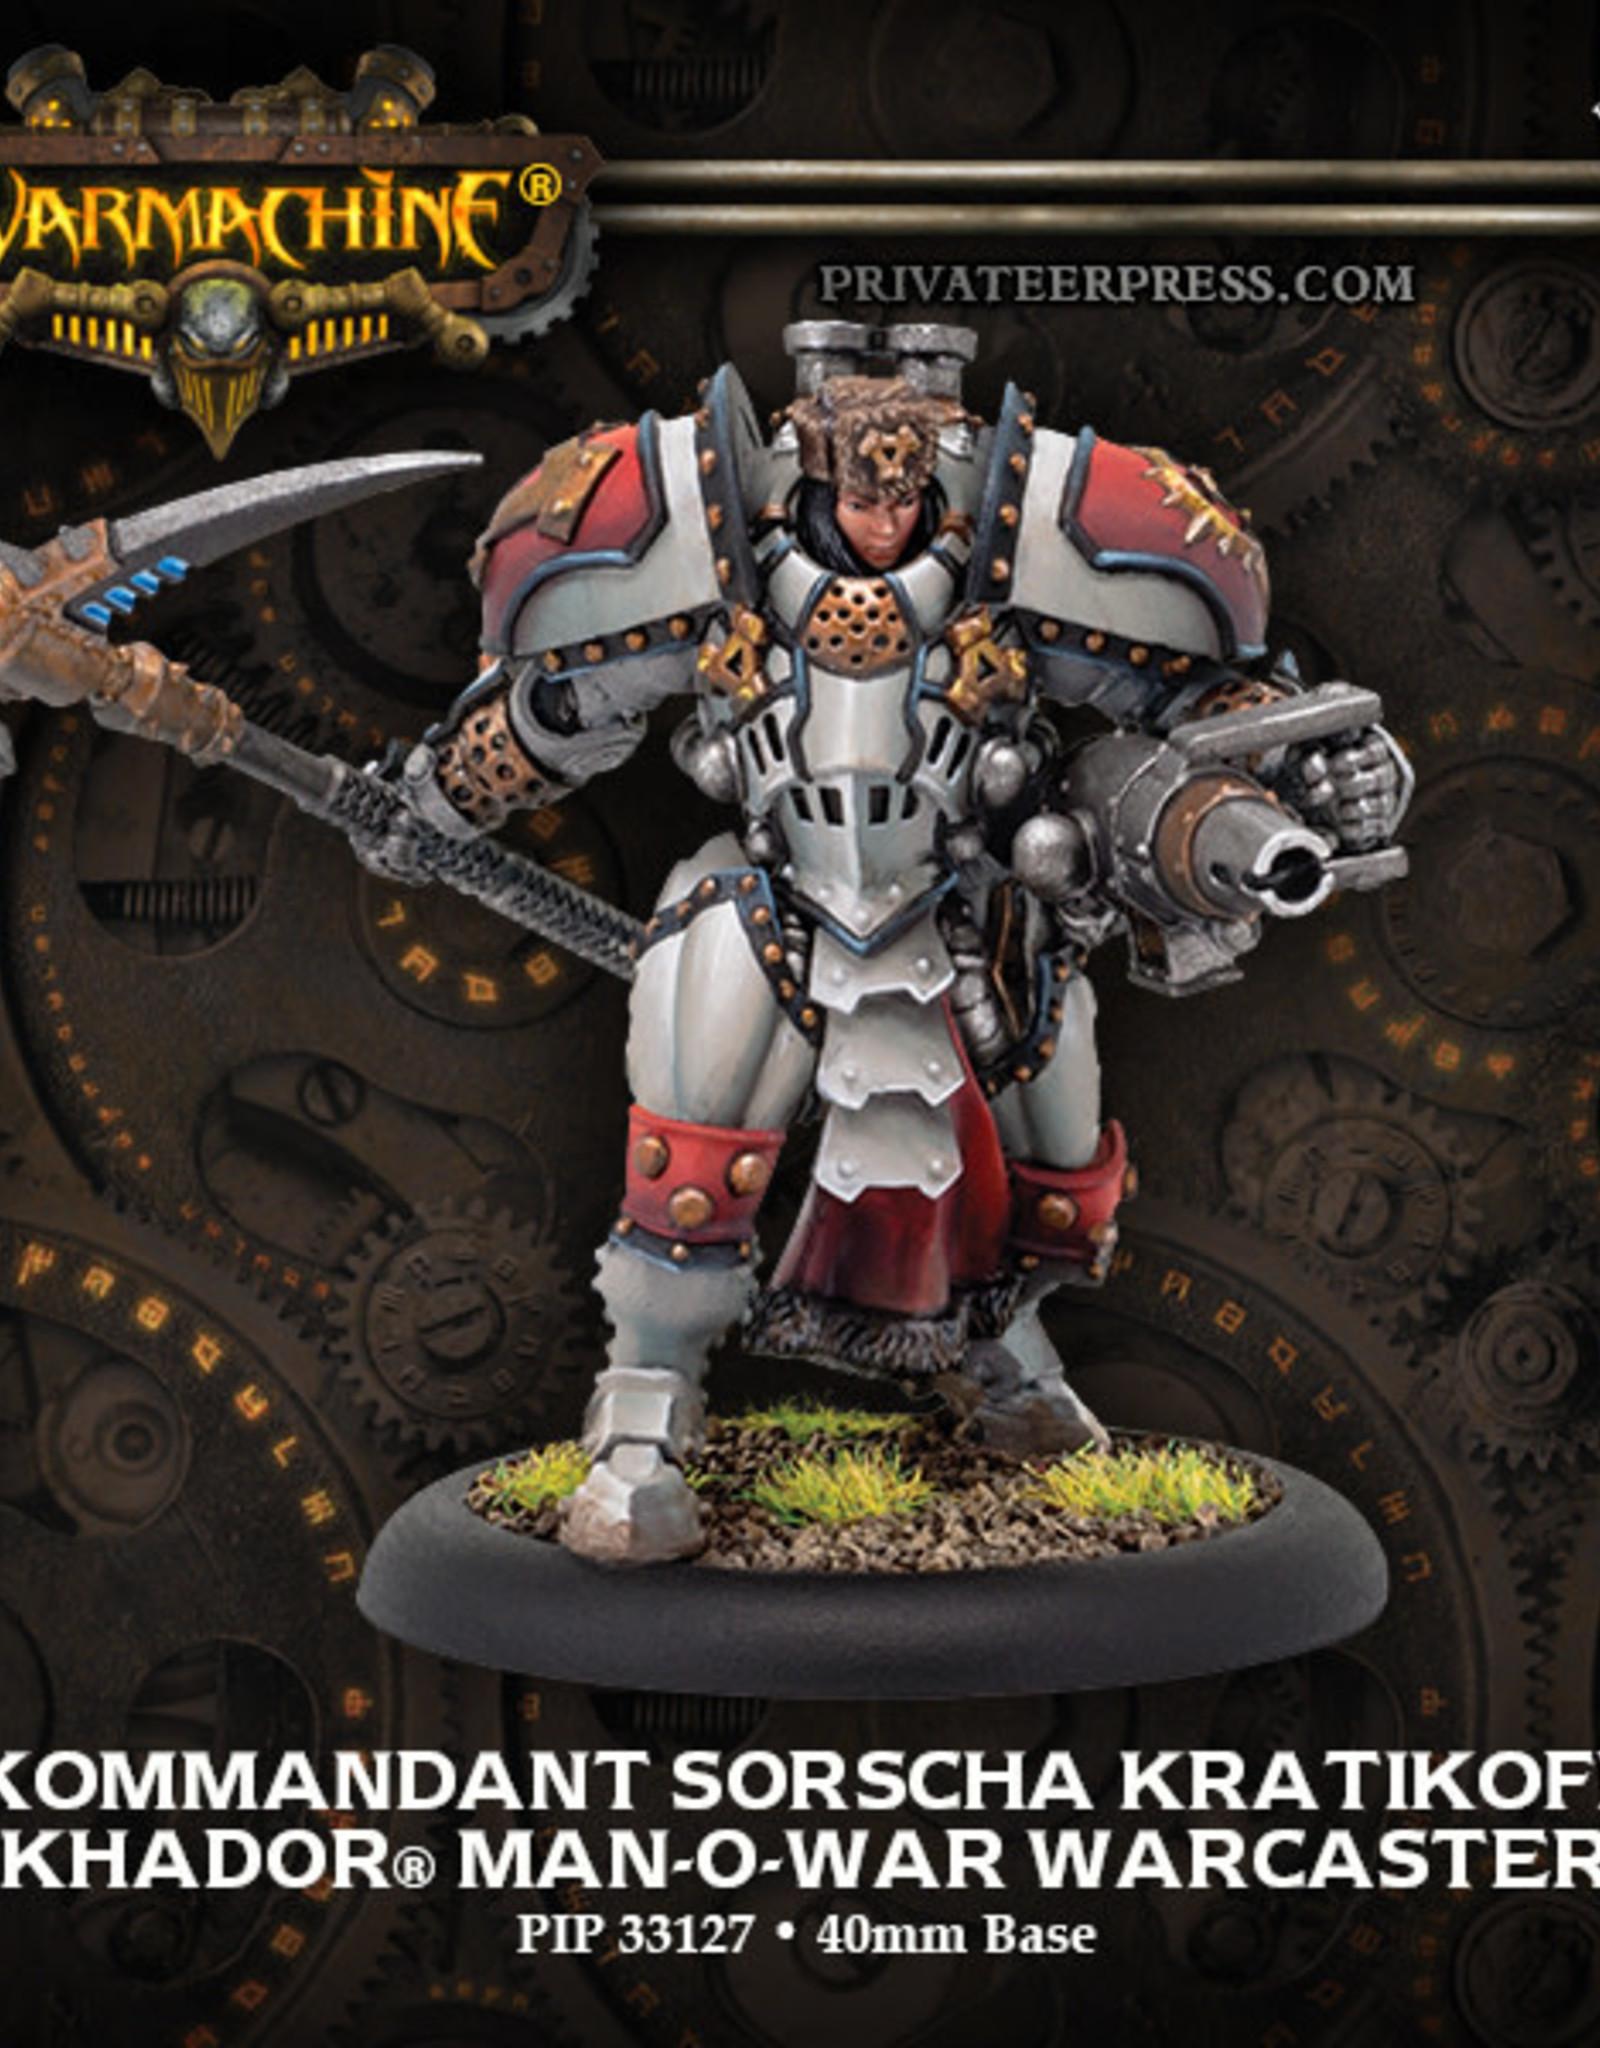 Warmachine Khador - Kommandant Sorcha Kratikoff